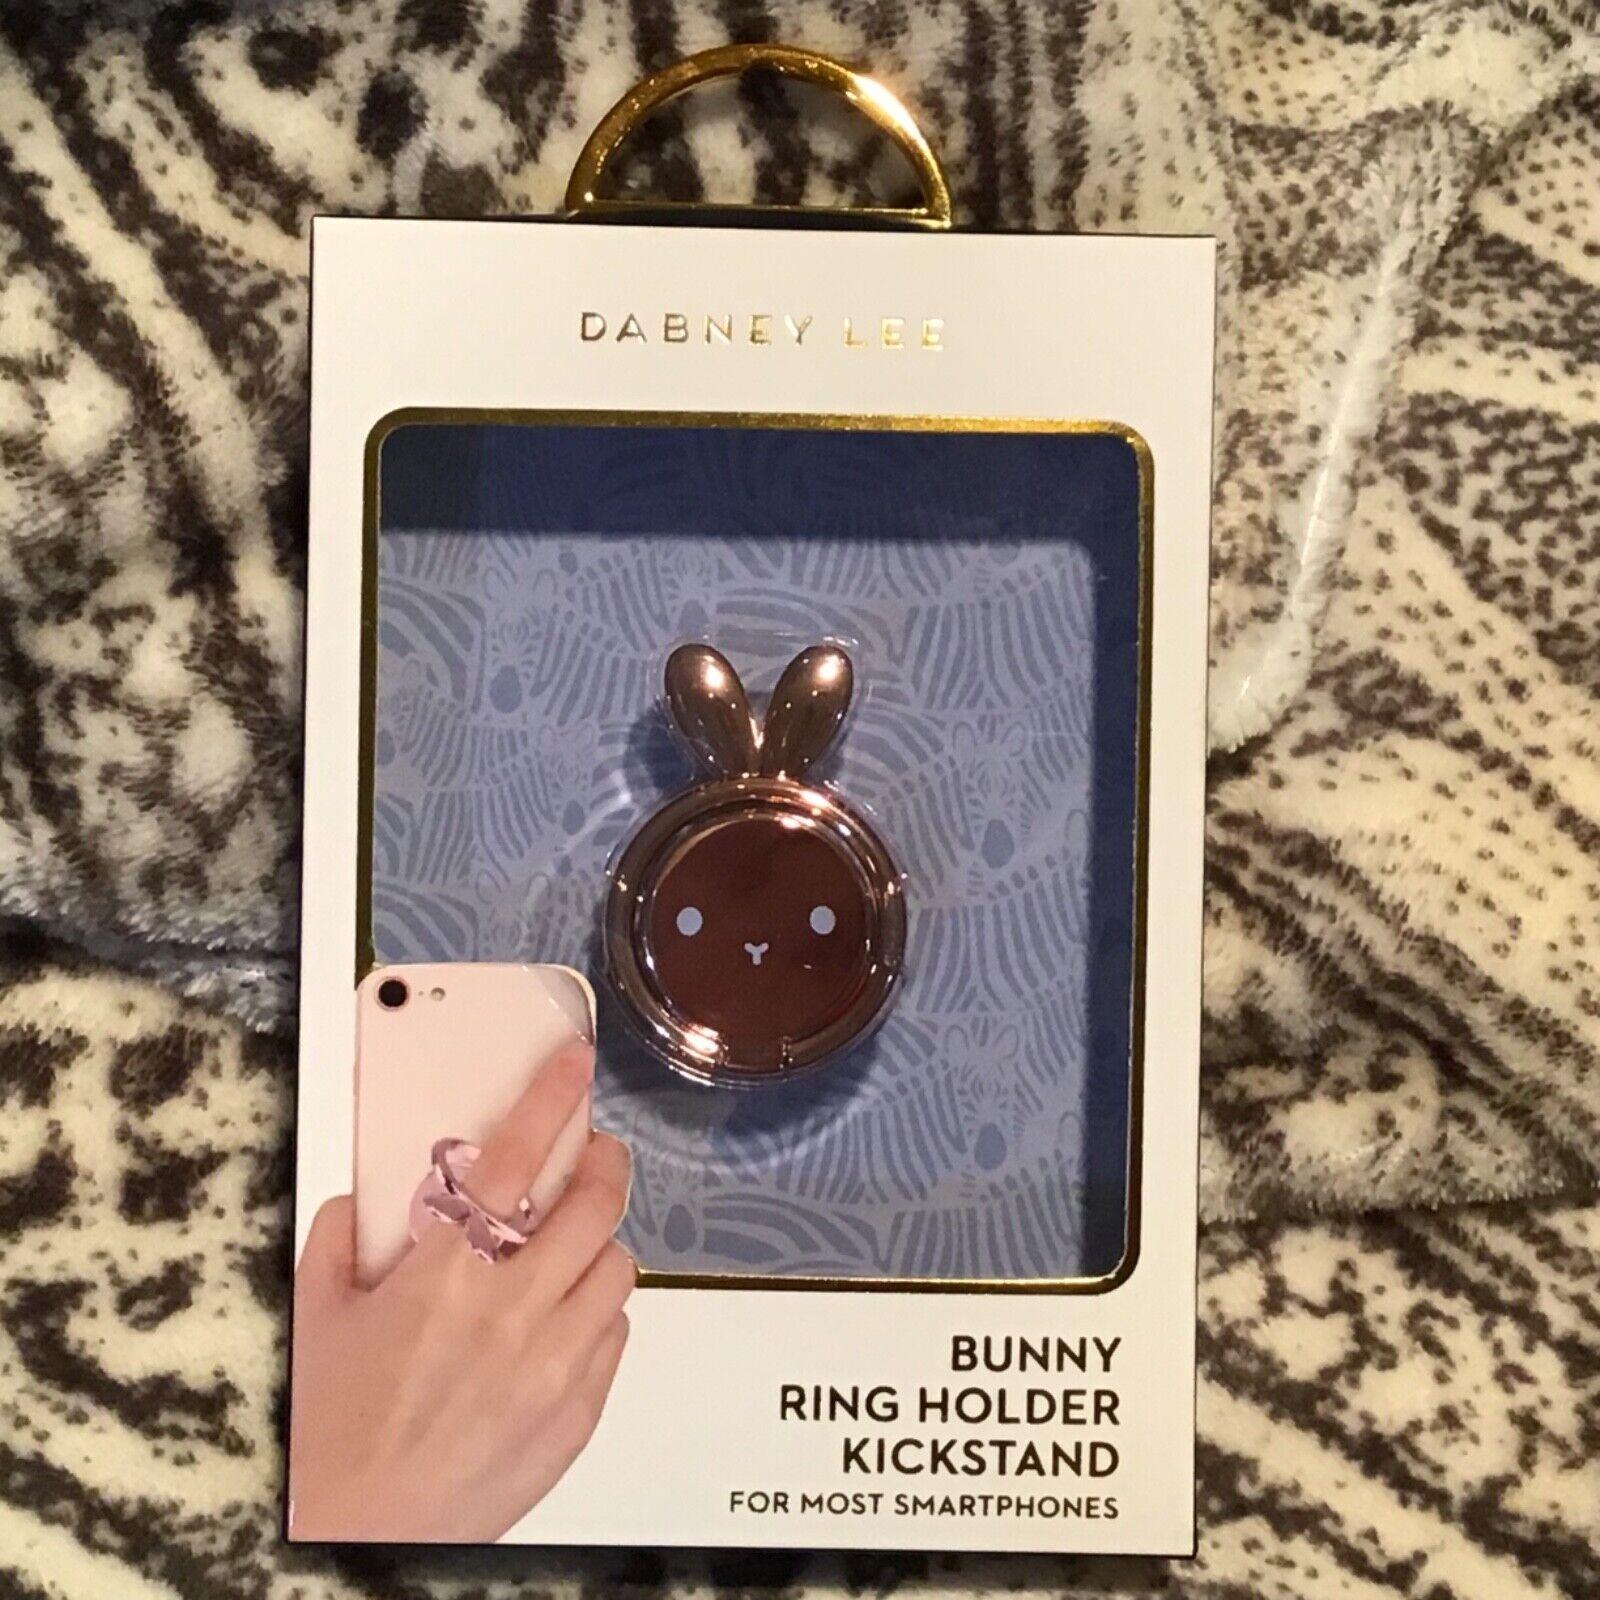 Dabney Lee Bunny Ring Holder Kickstand Rose Gold iPhone Sams